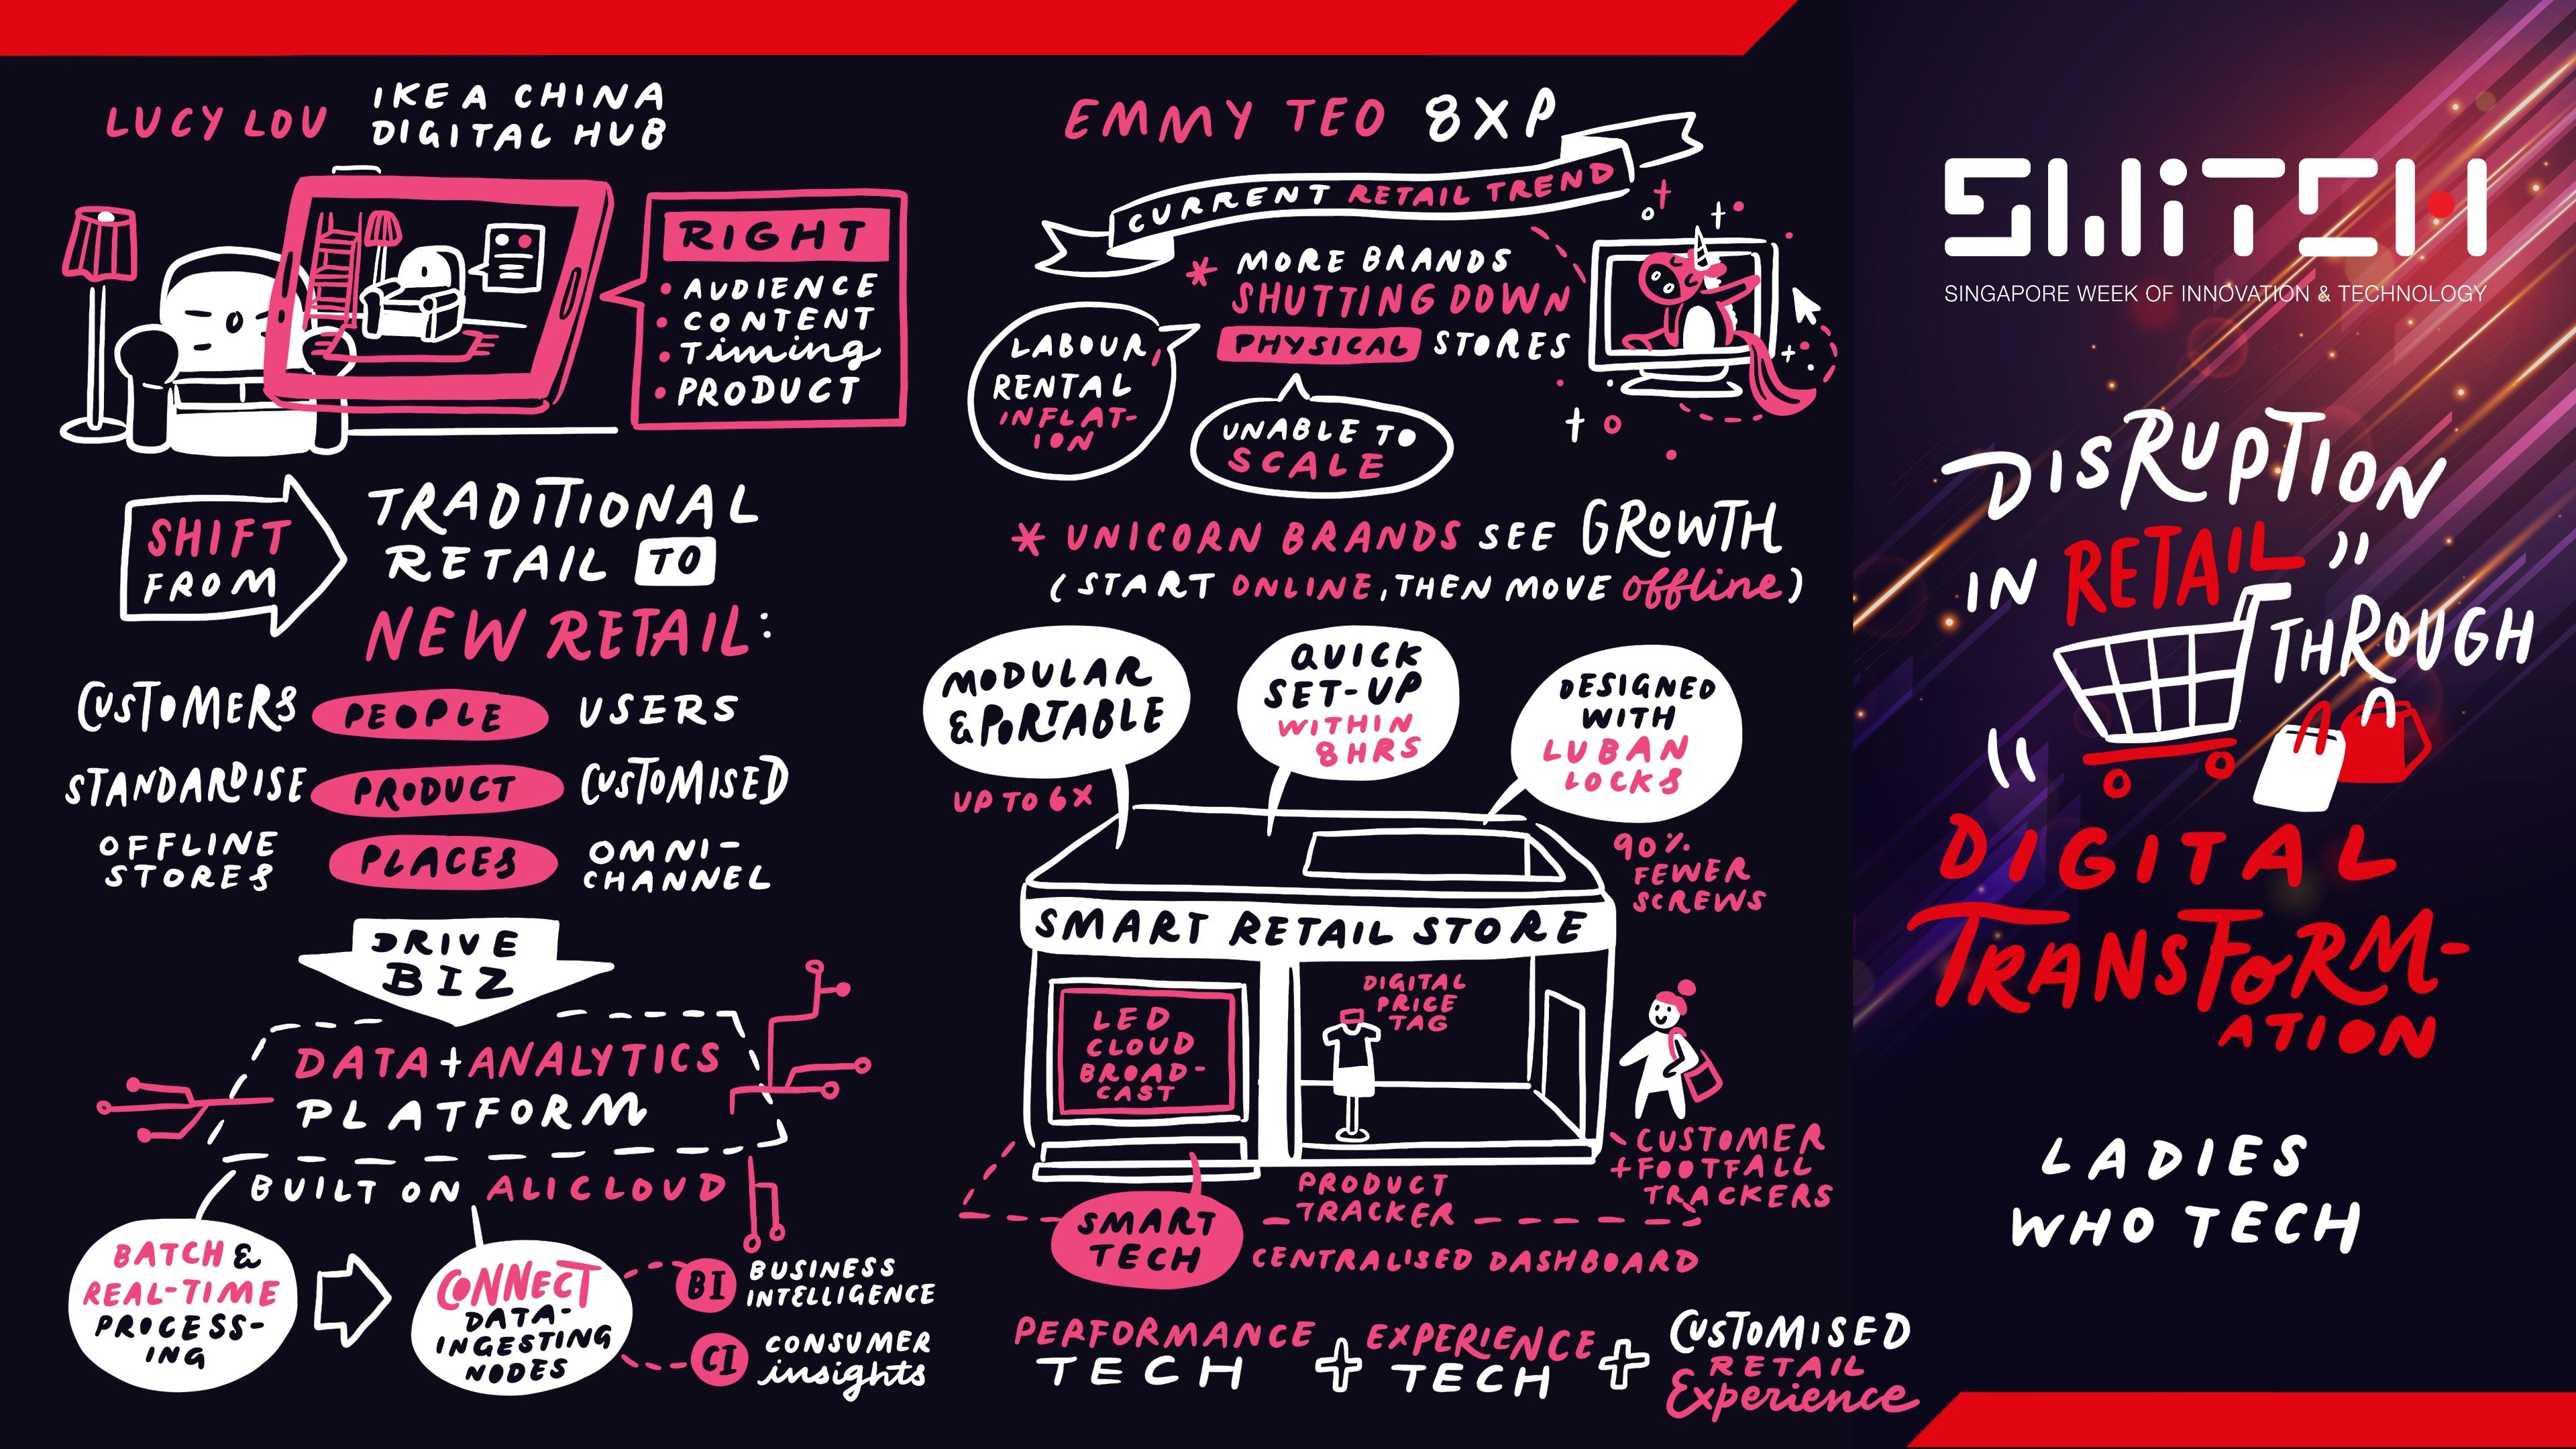 Disruption in Retail through Digital Transformation